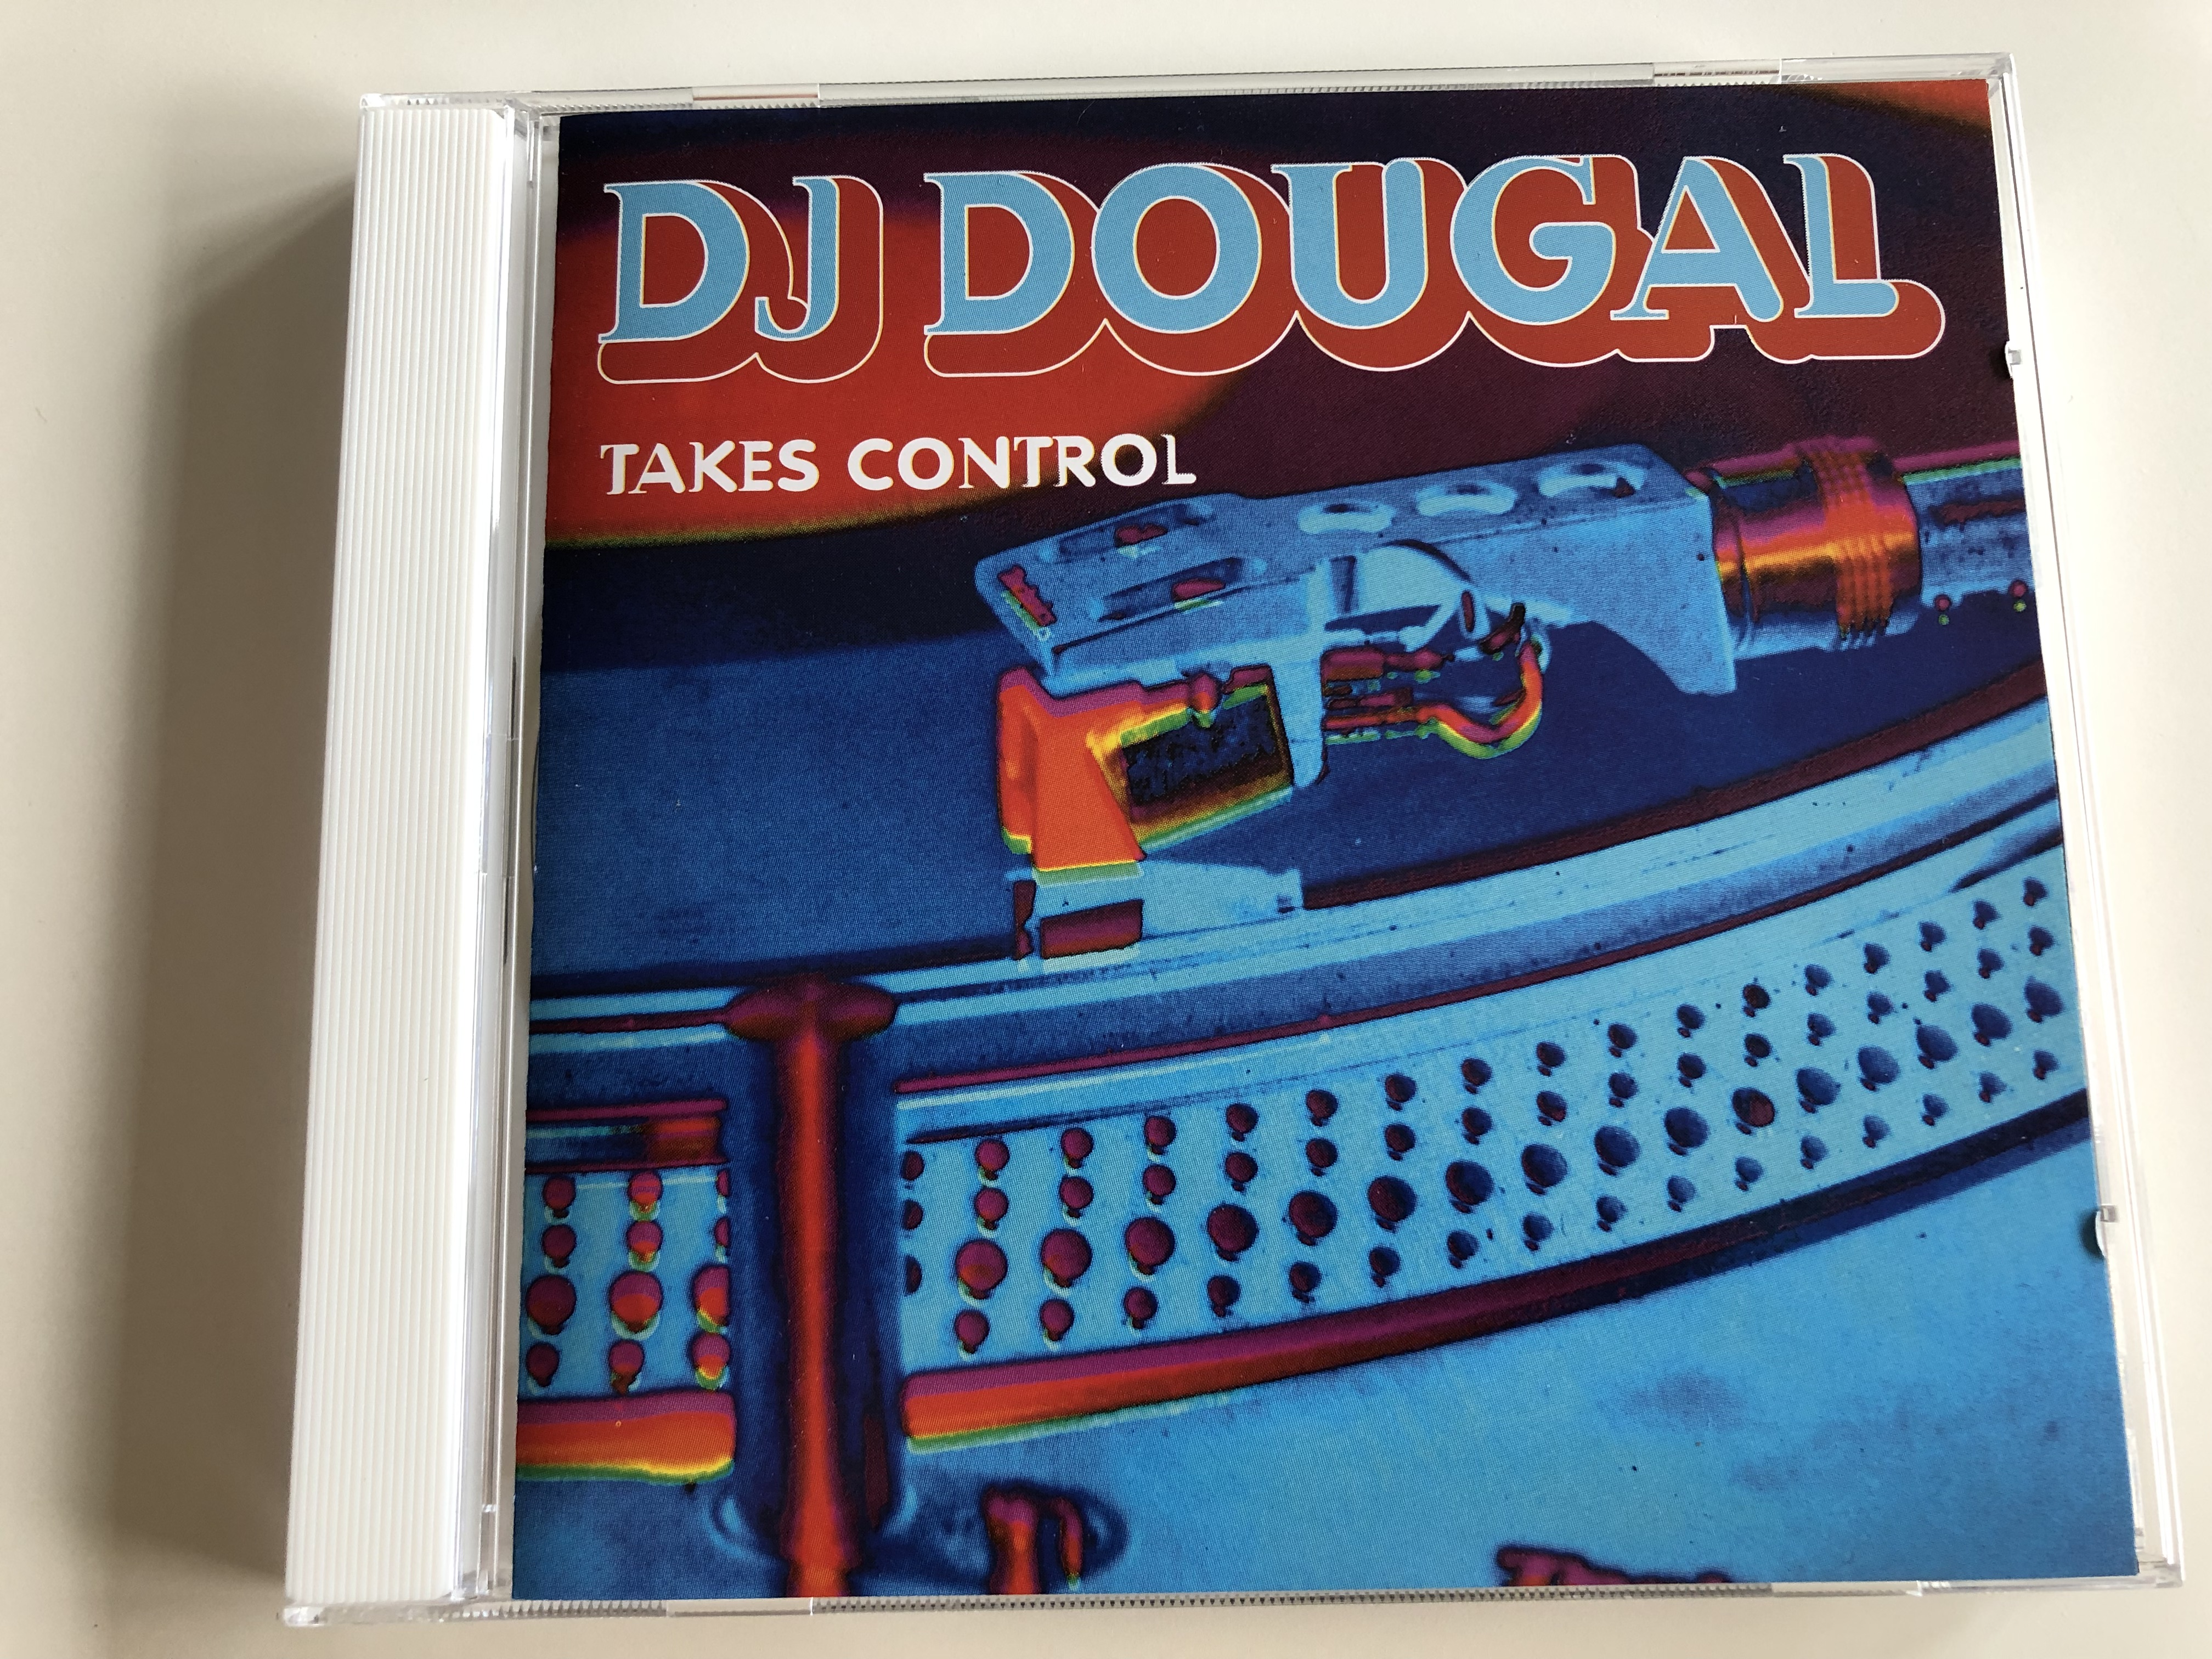 dj-dougal-takes-control-eruption-dougal-skeedale-dj-ham-ramos-supreme-hopscotch-audio-cd-1996-kikcd39-1-.jpg